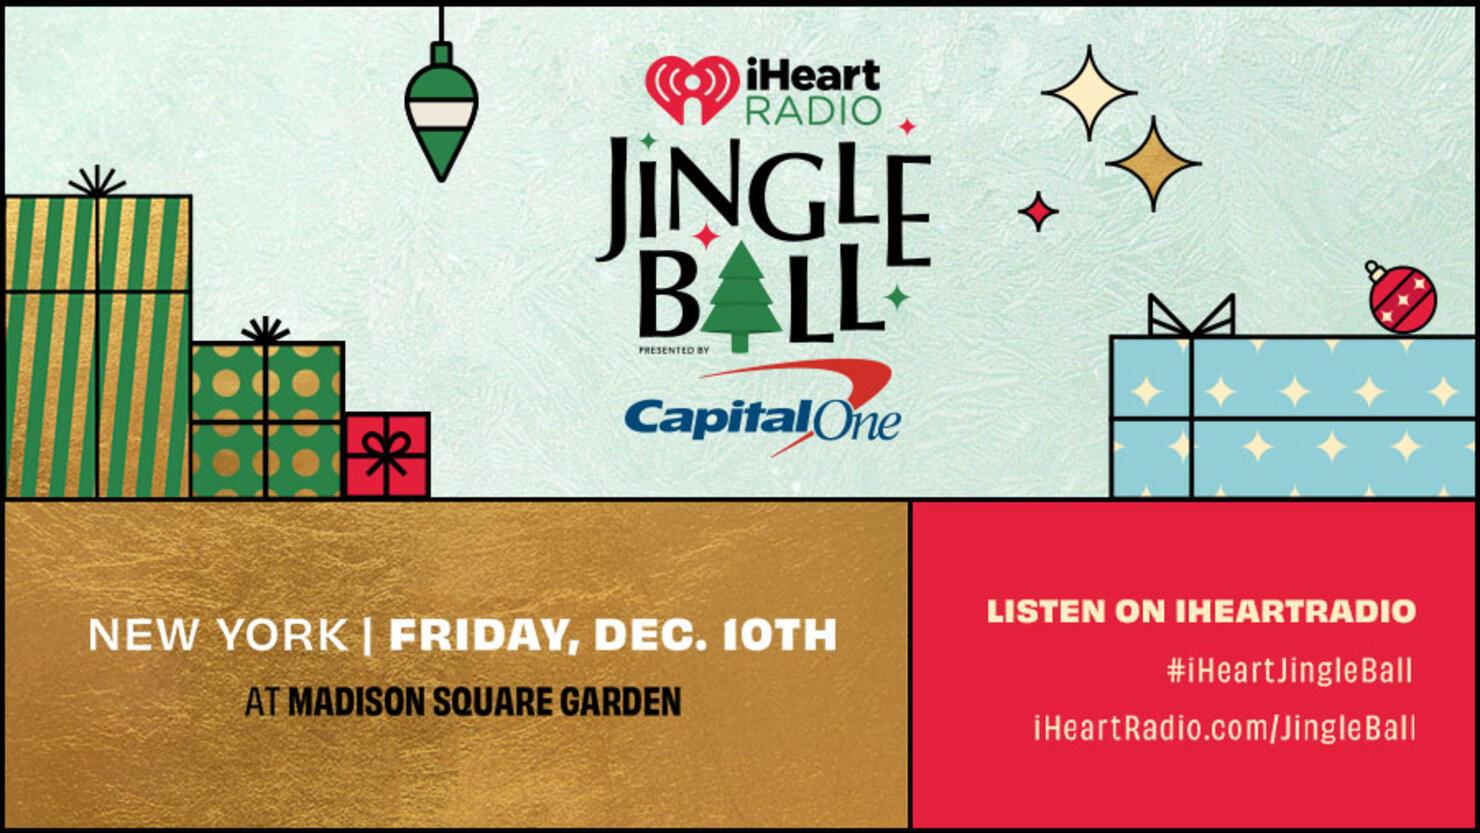 iHeartRadio Jingle Ball Tour presented by Capital One